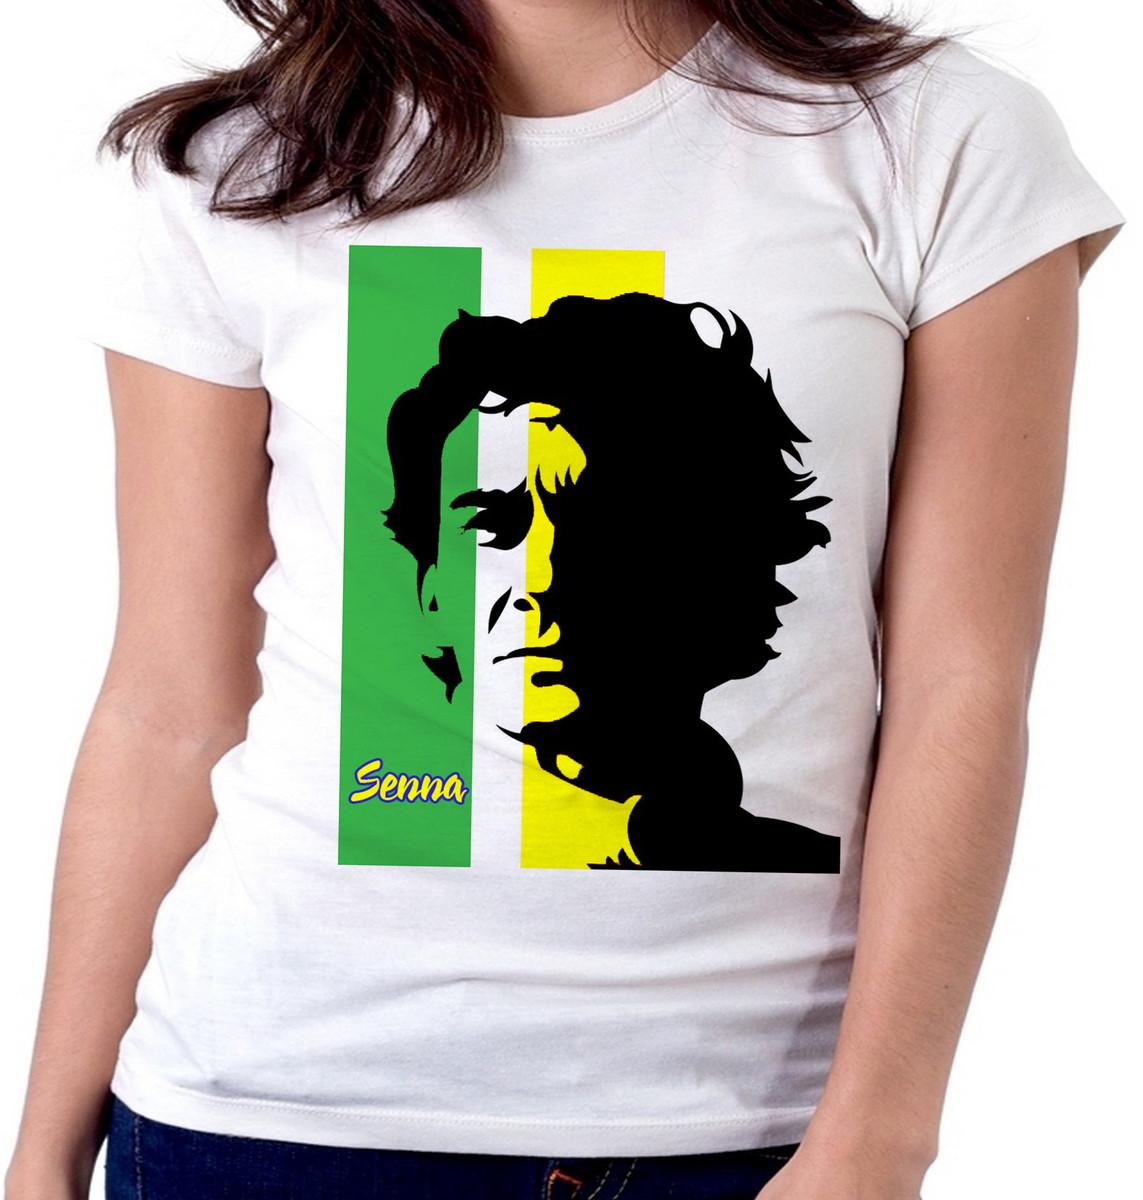 6a58b15a2b867 Blusa feminina baby look camiseta Ayrton Senna formula carro no Elo7 ...